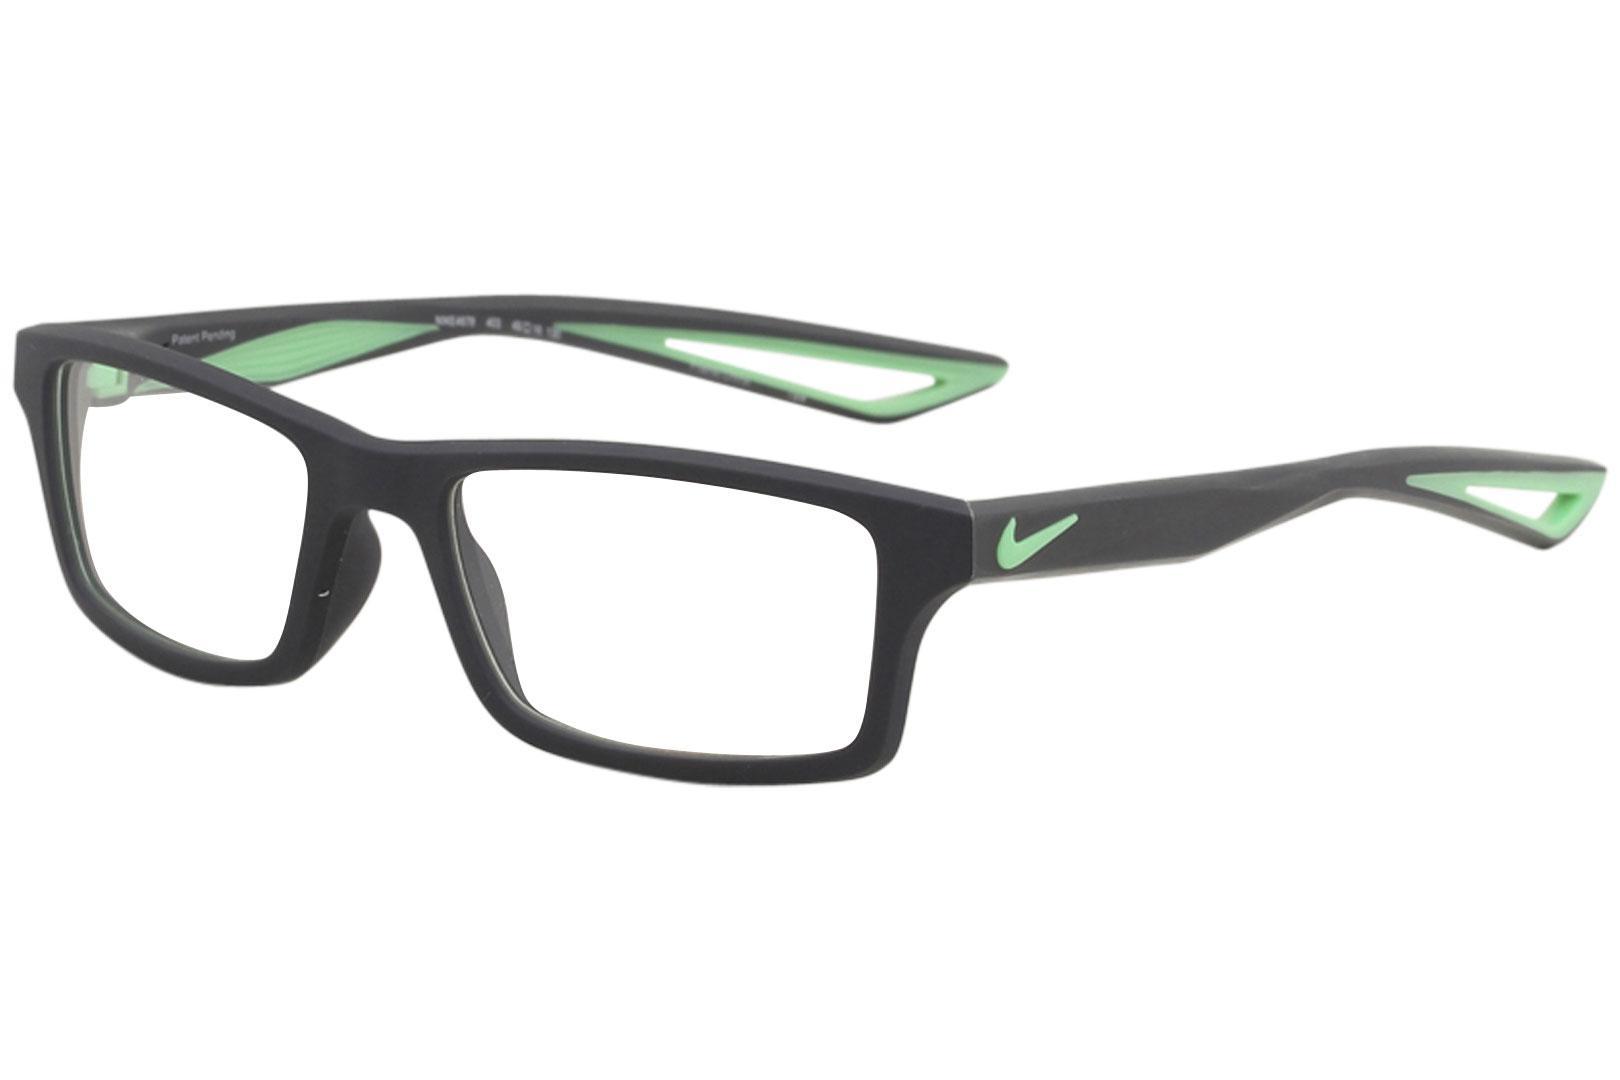 dc468f904f67 Nike Youth Boy s Eyeglasses 4678 Full Rim Flexon Optical Frame